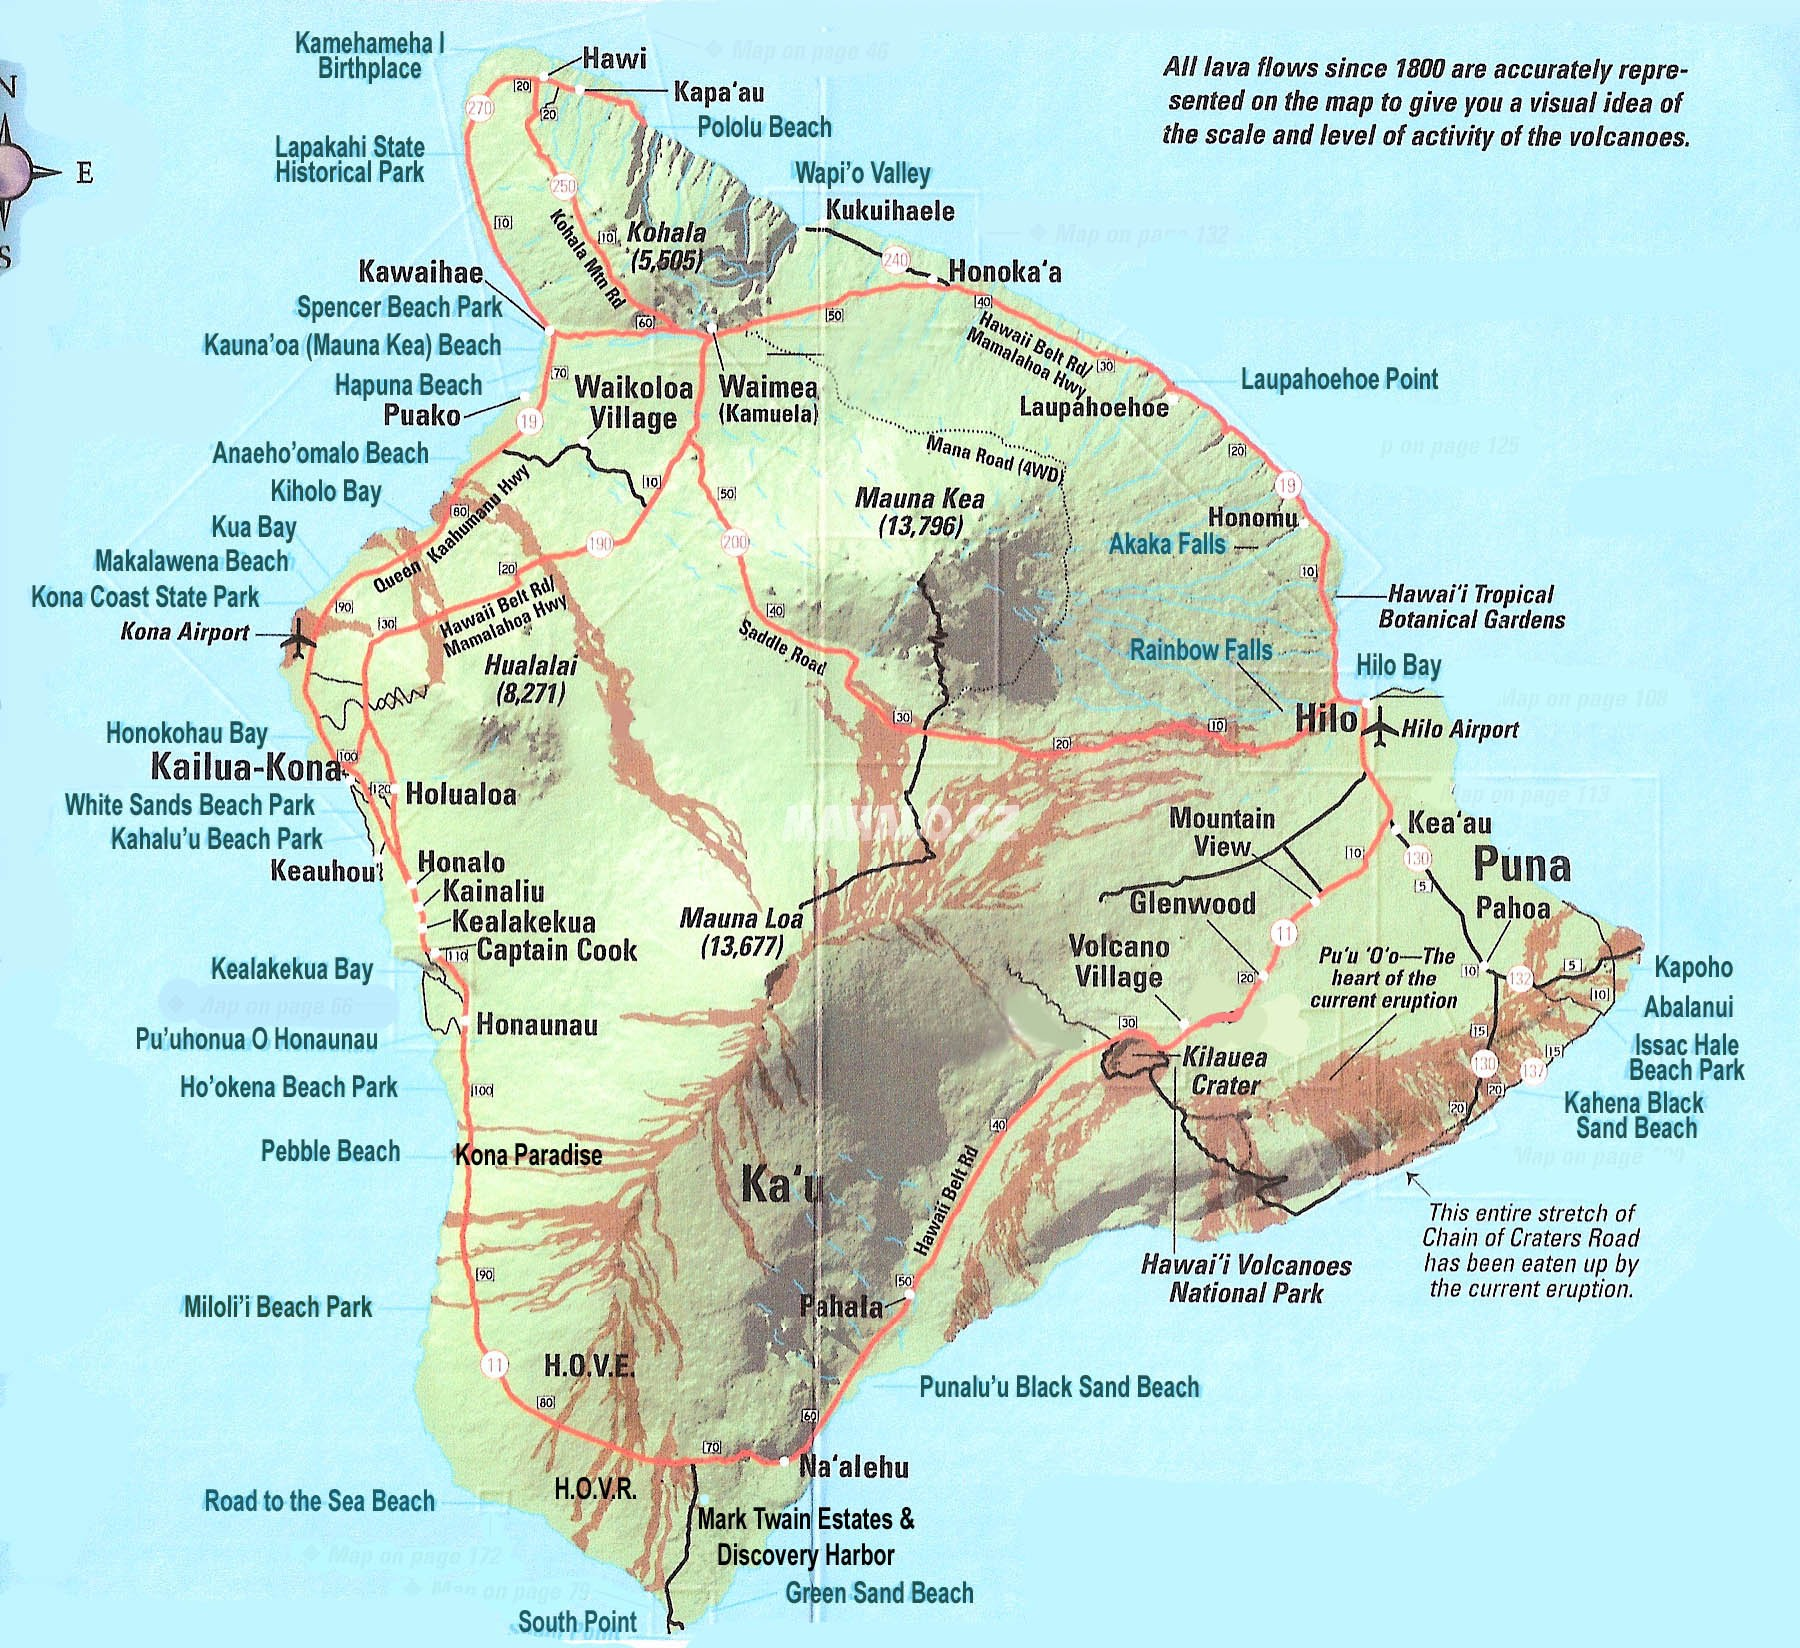 Pruvodce Po Ostrove Big Island Hawaii Island Havajske Ostrovy